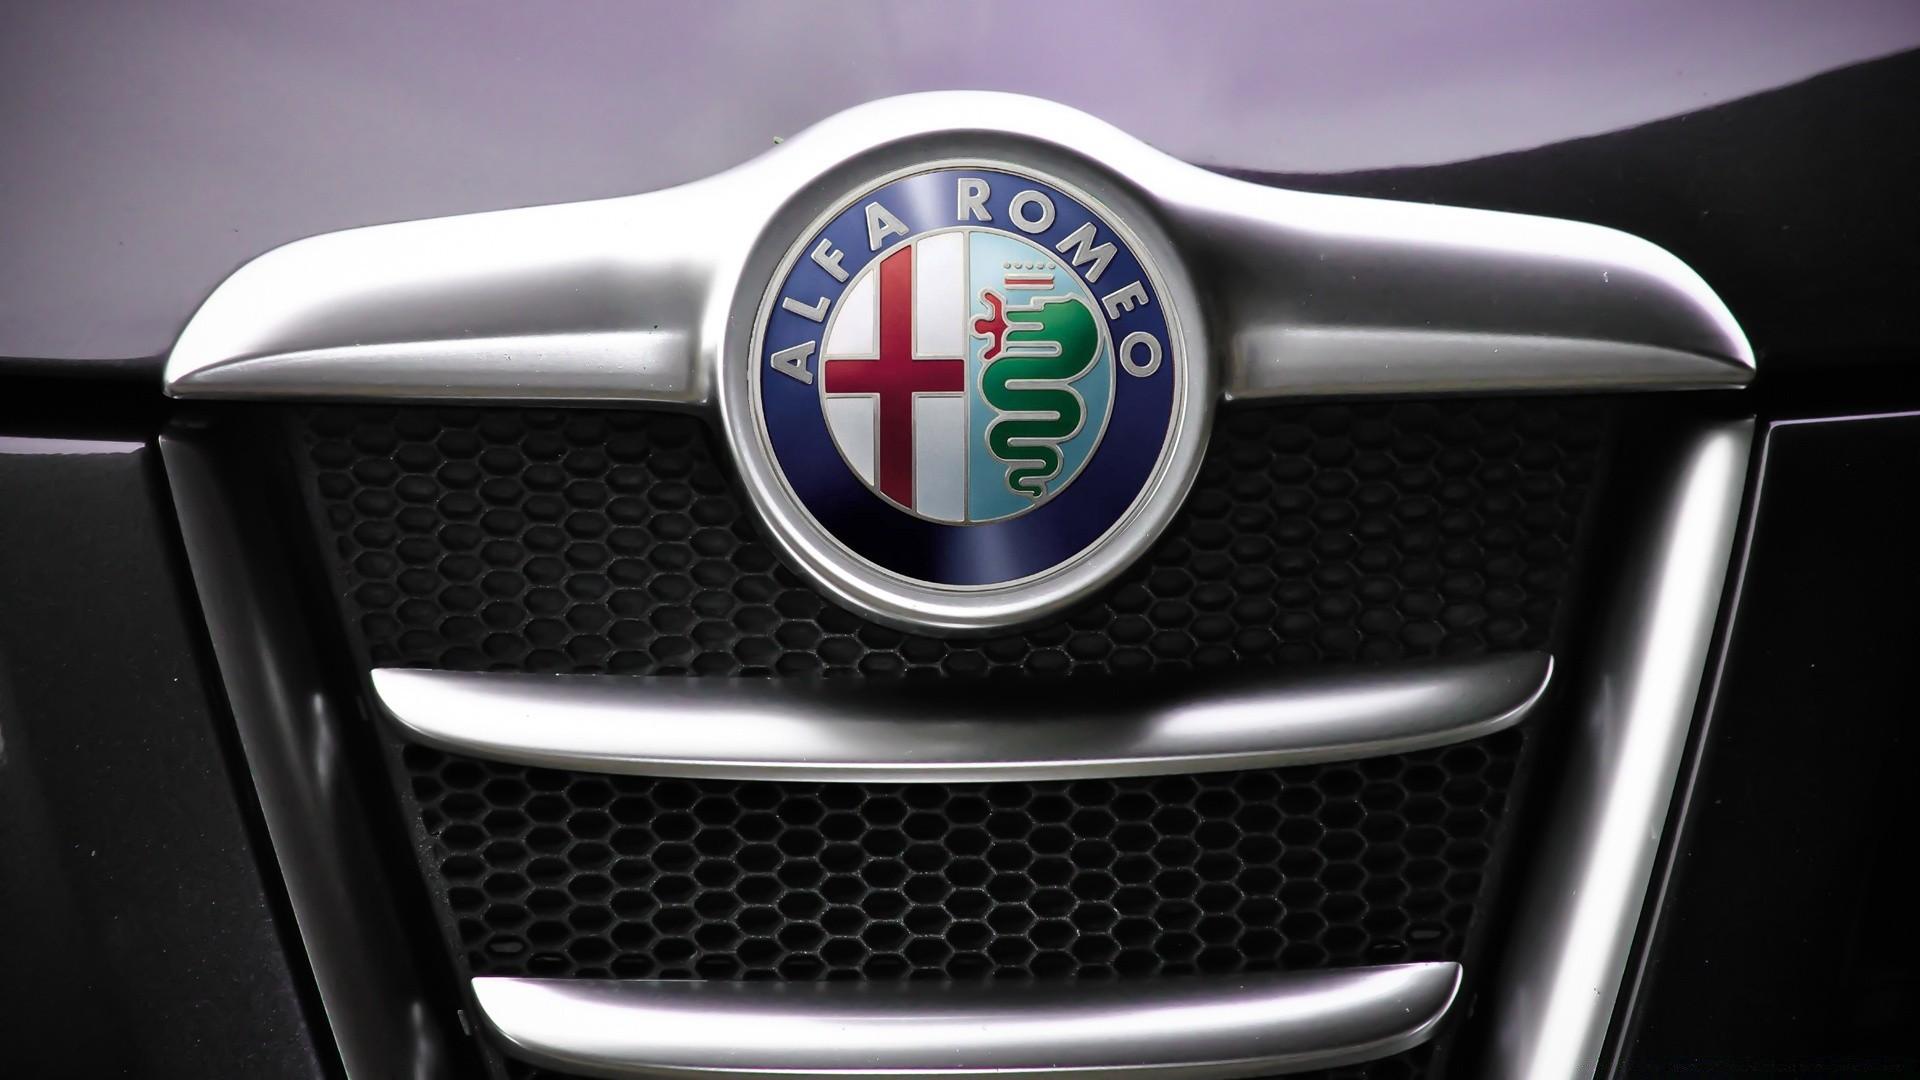 Alfa Romeo 159  № 701225 бесплатно